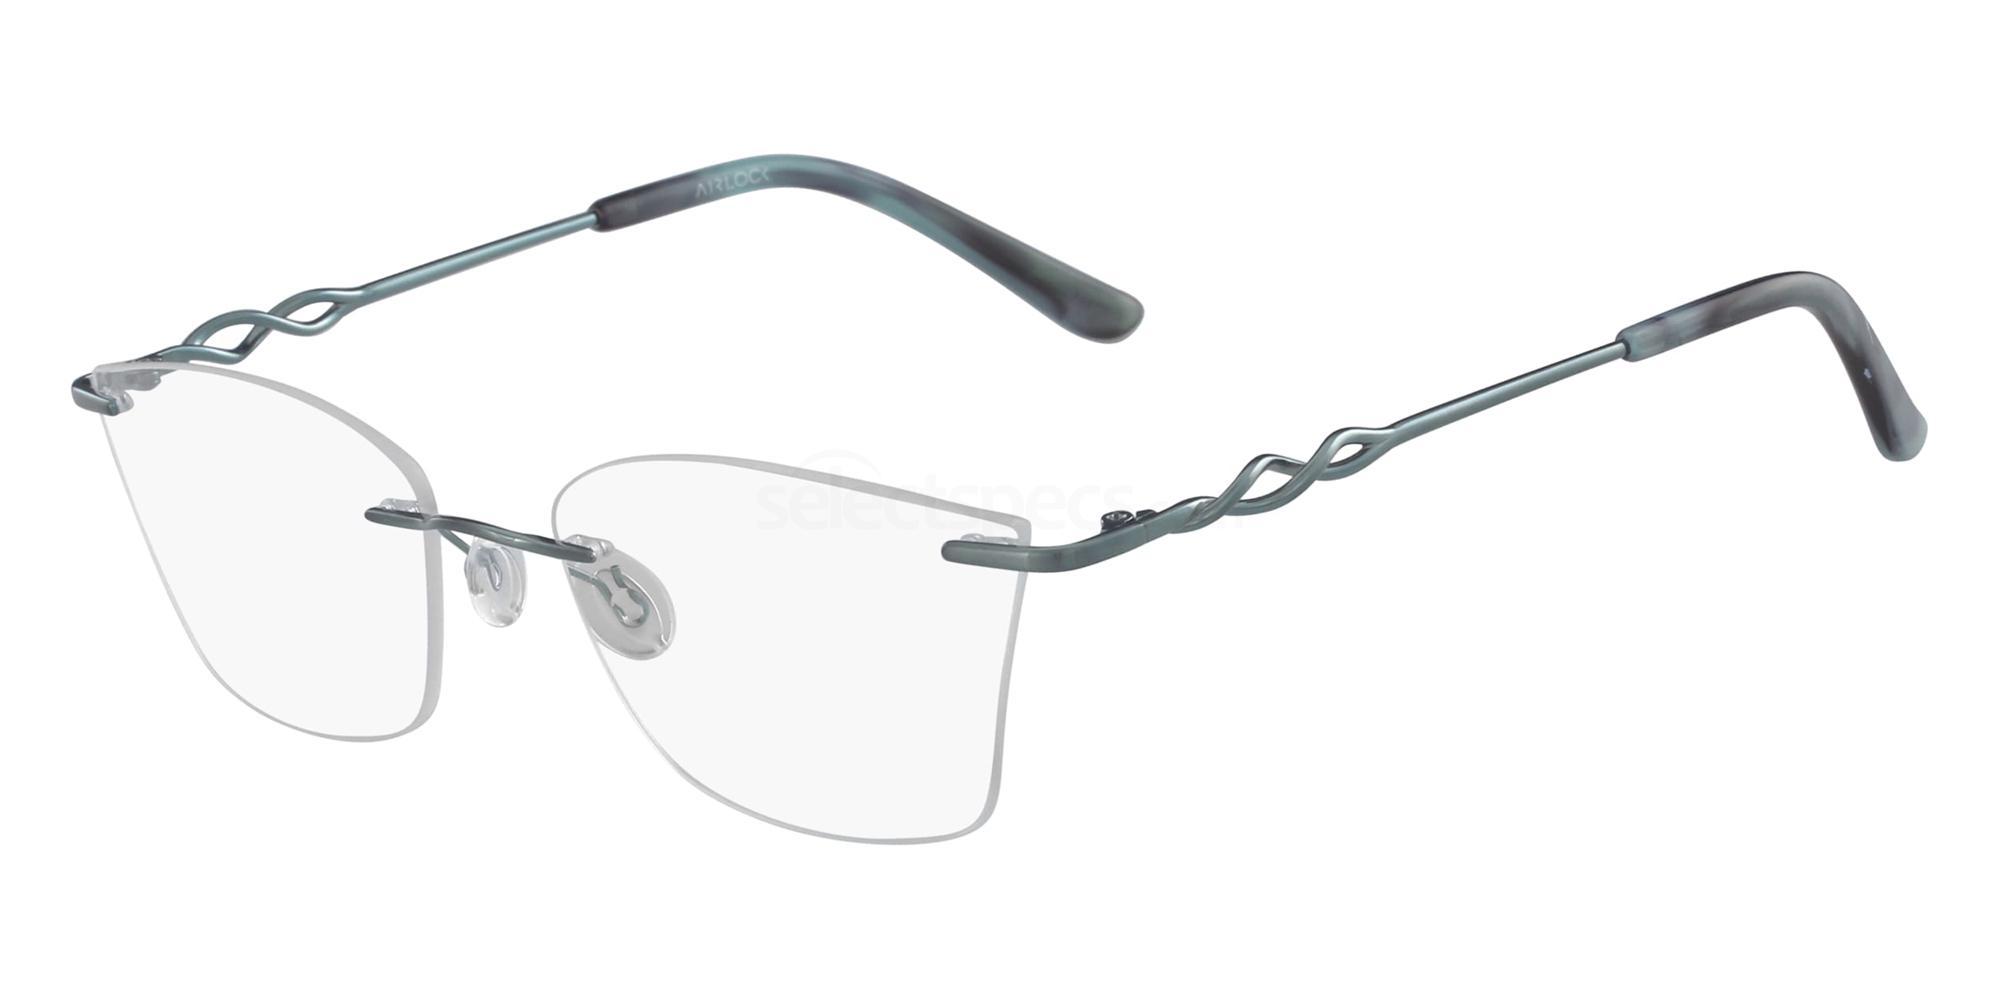 300 ESSENCE 205 Glasses, AIRLOCK